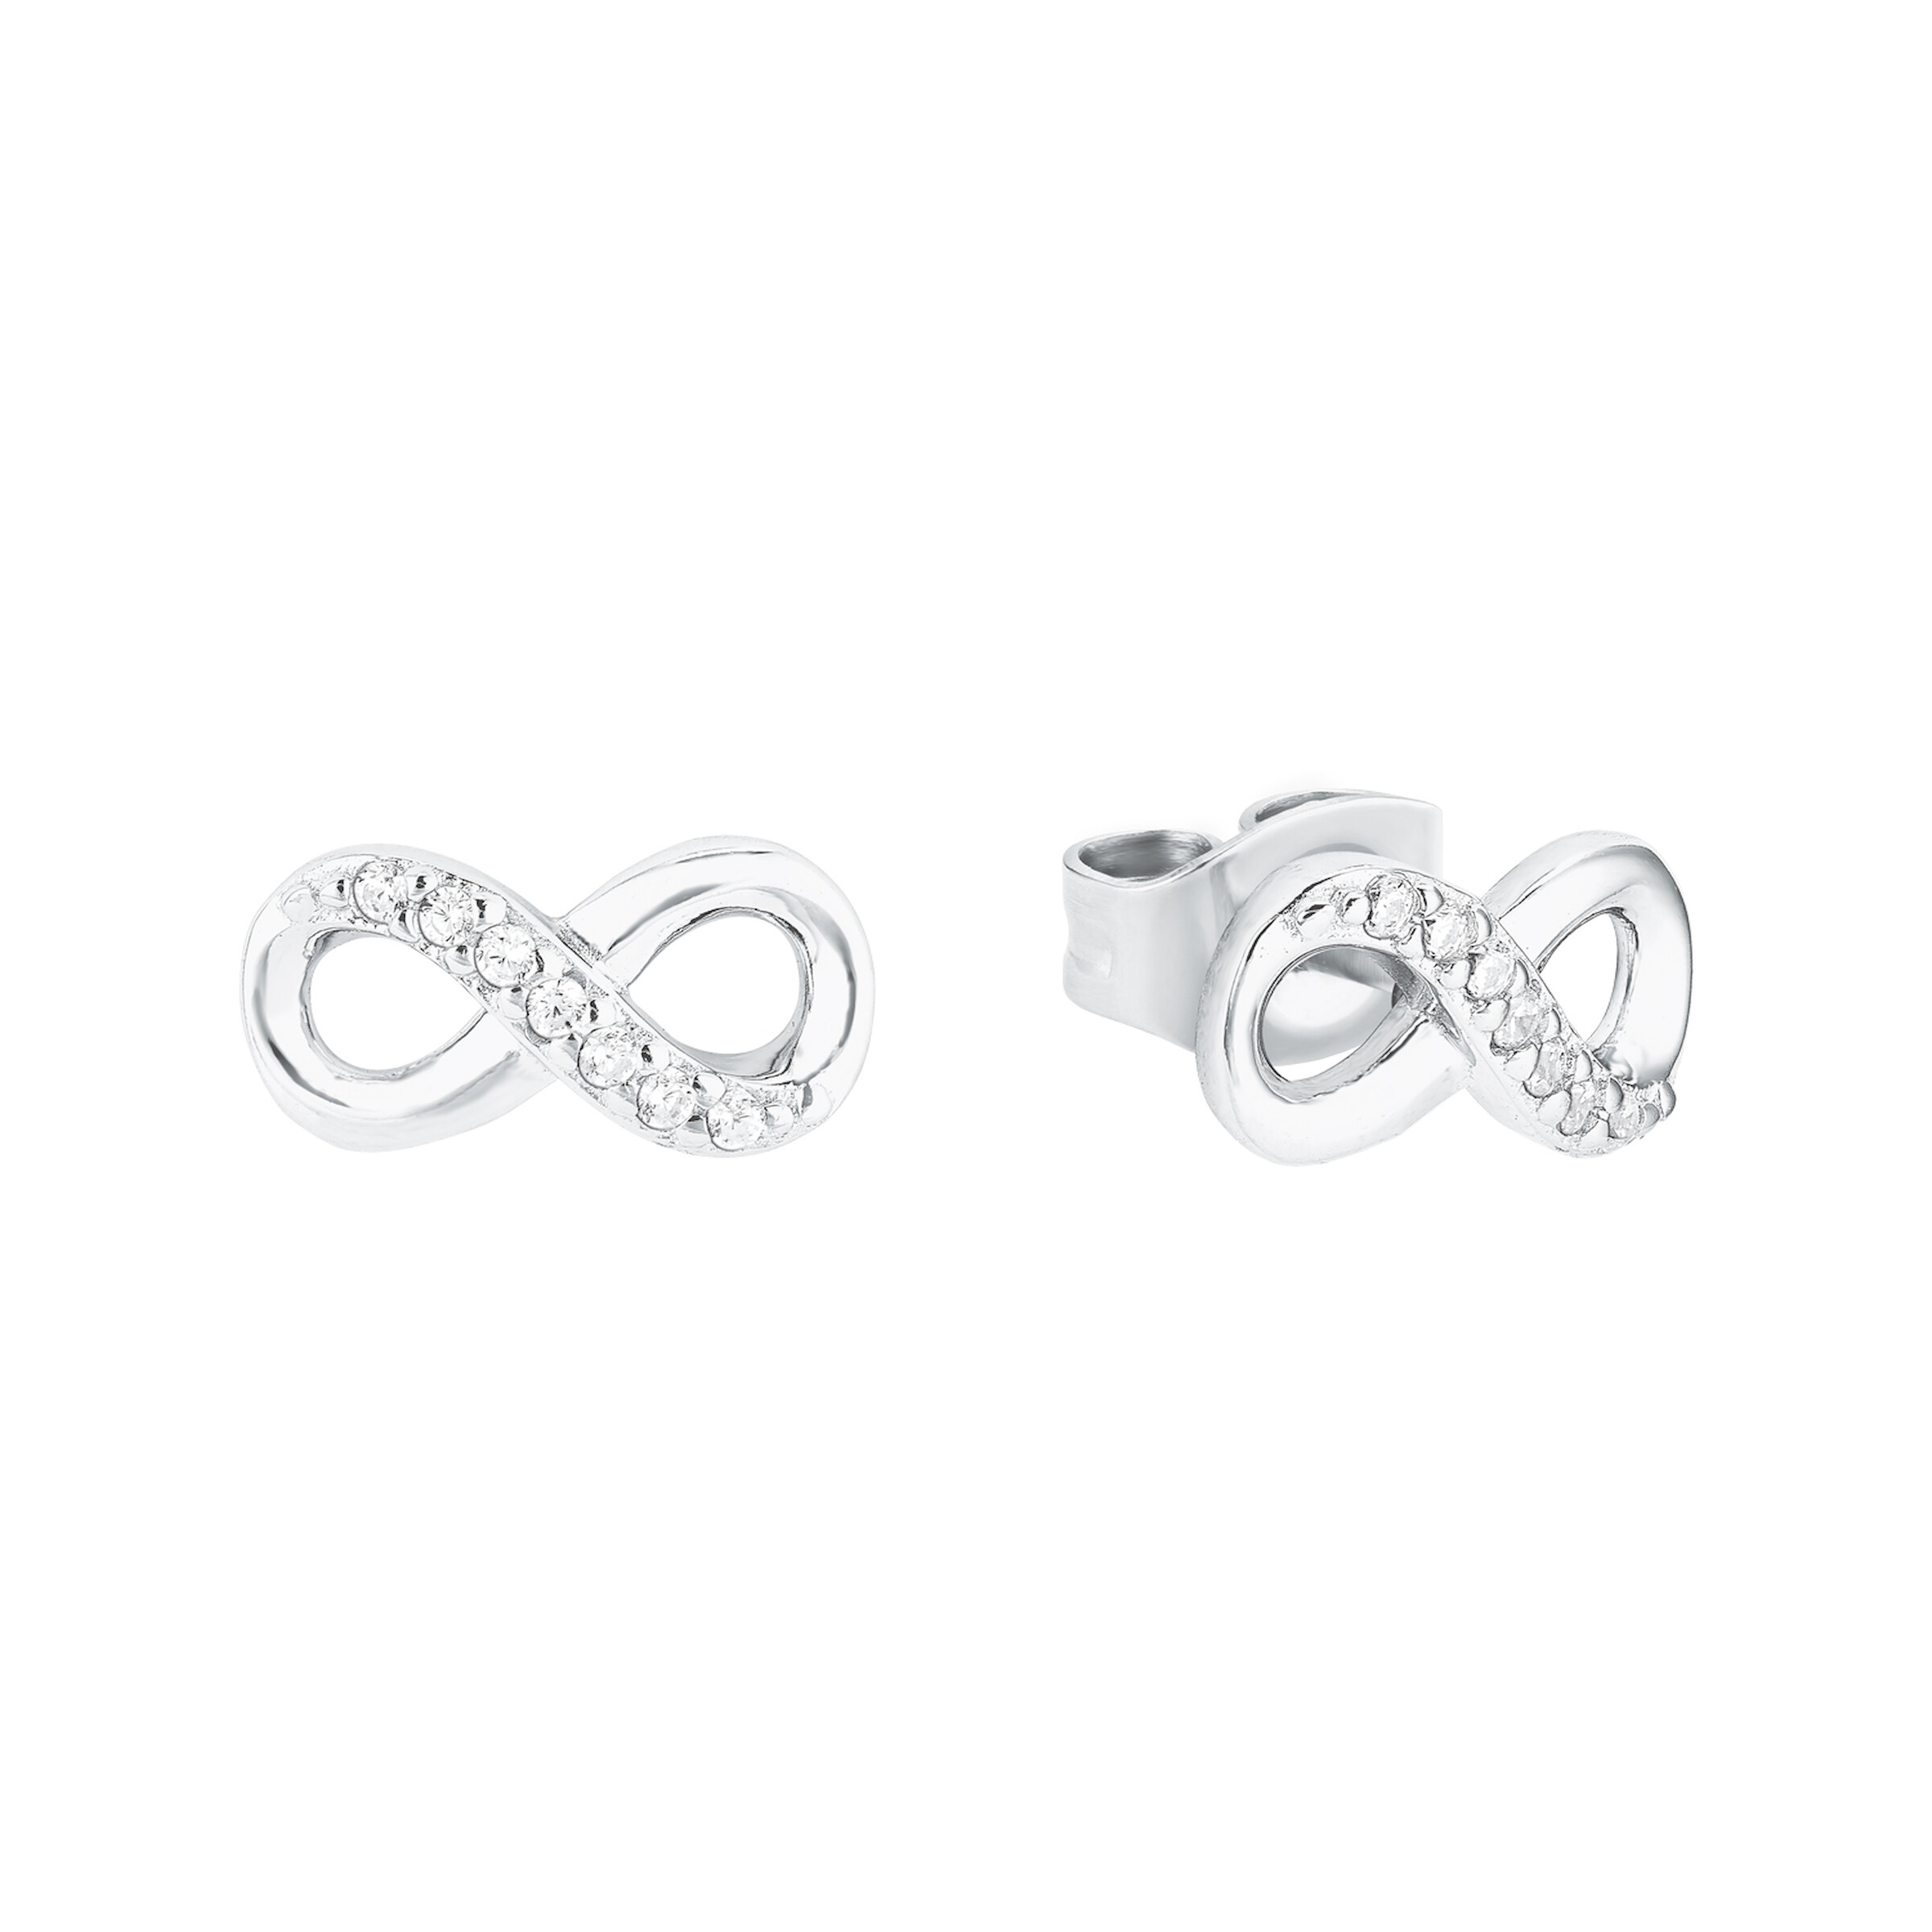 Set Silber 925, rhodiniert Swarovski Kristall® Infinity